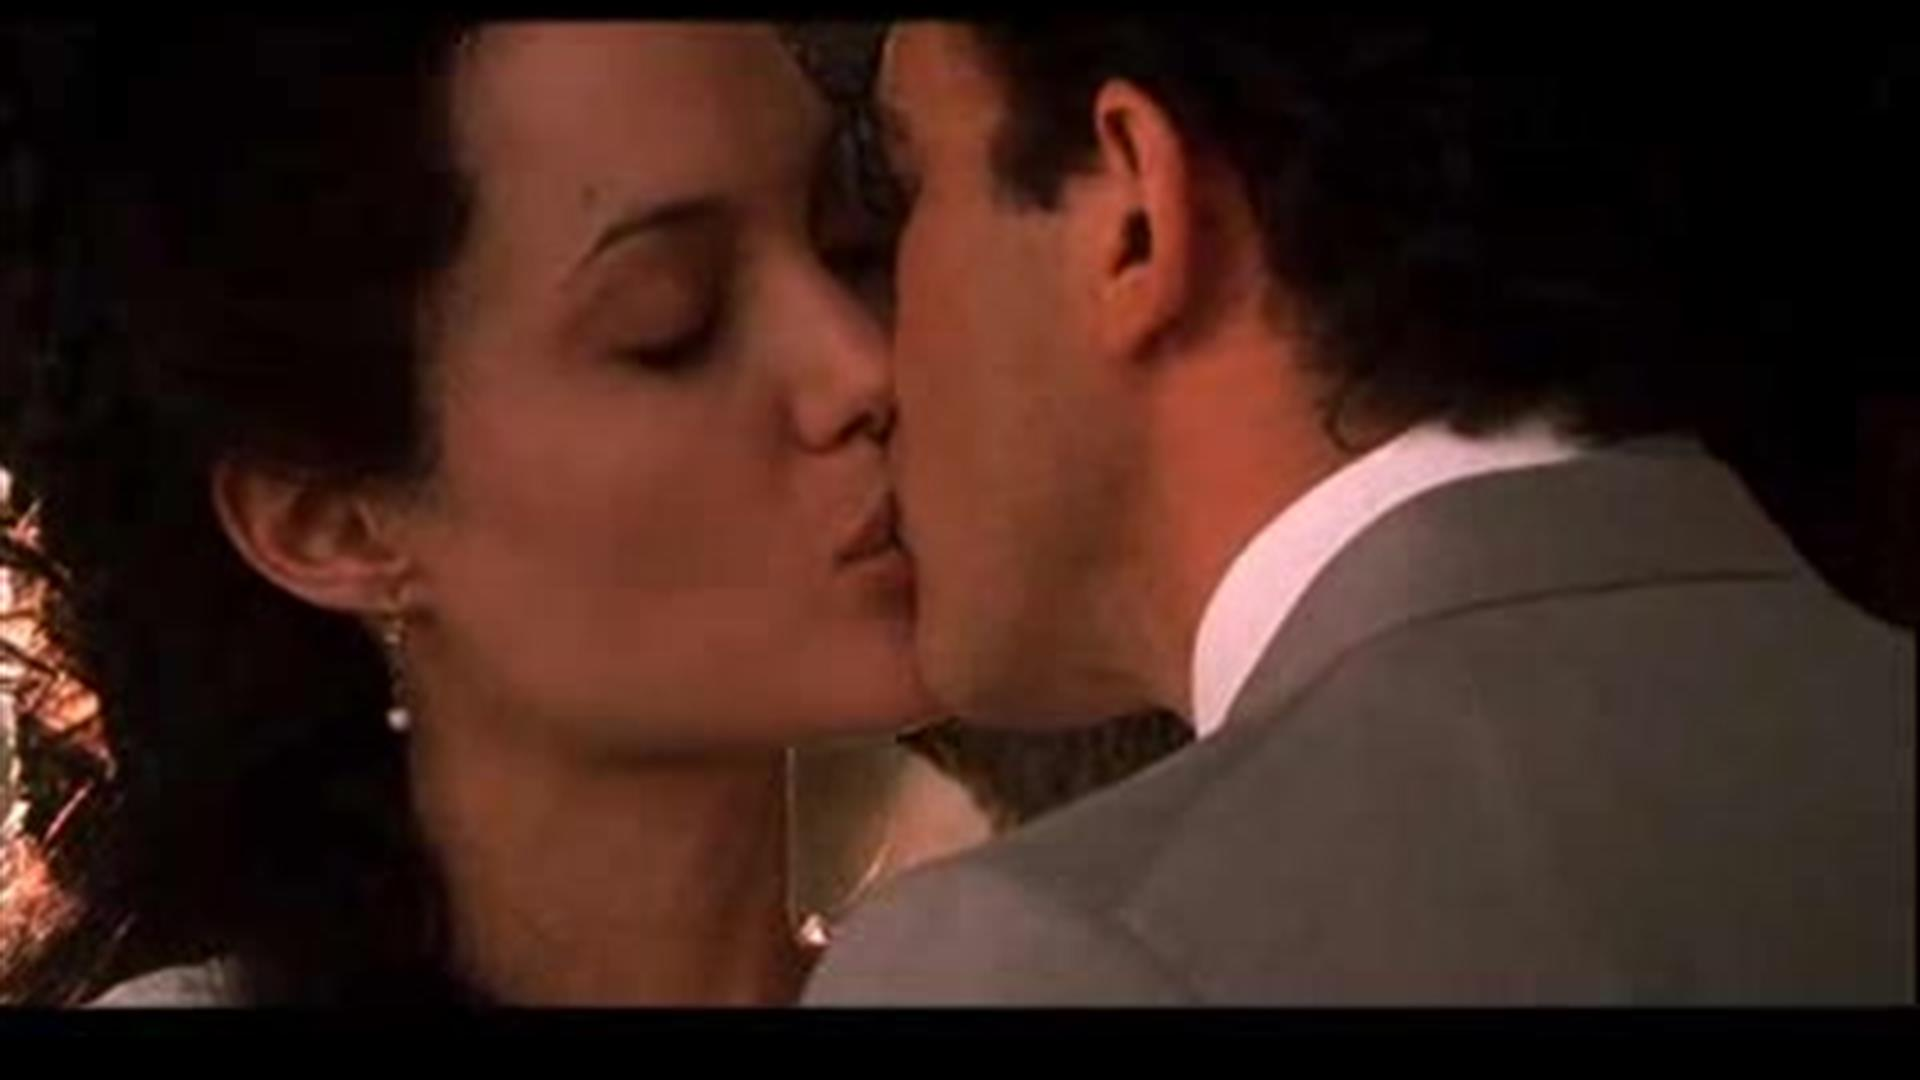 Angelina Jolie Original Sin video extra - date night: original sin - amc